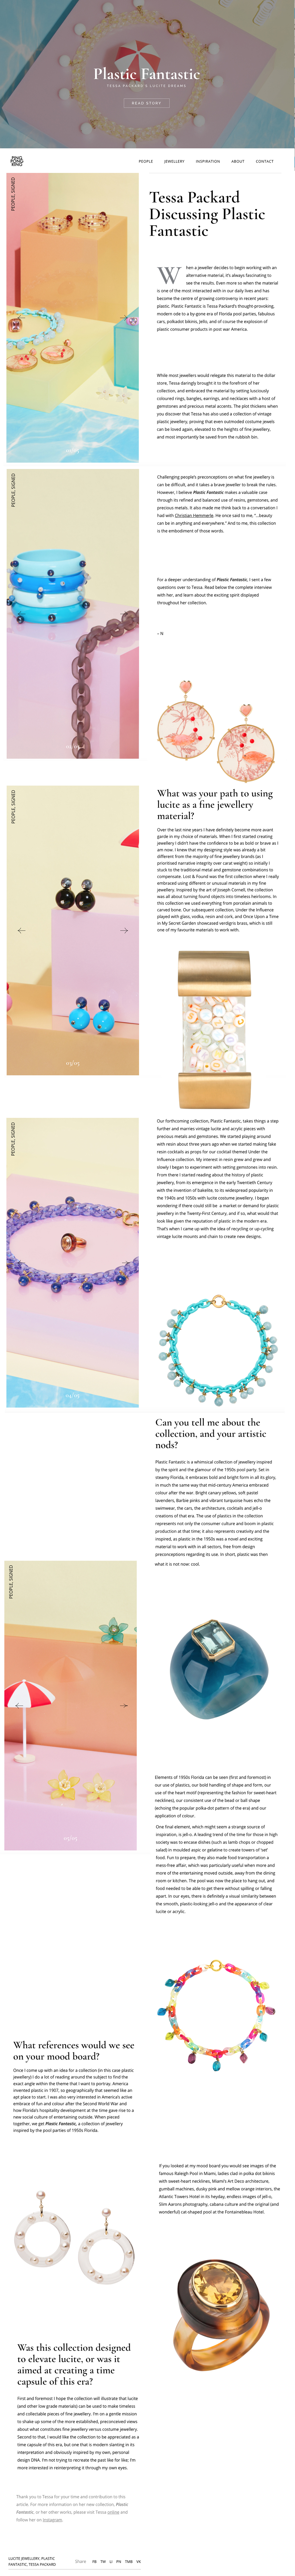 plastic fantastic lucite jewellery tessa packard